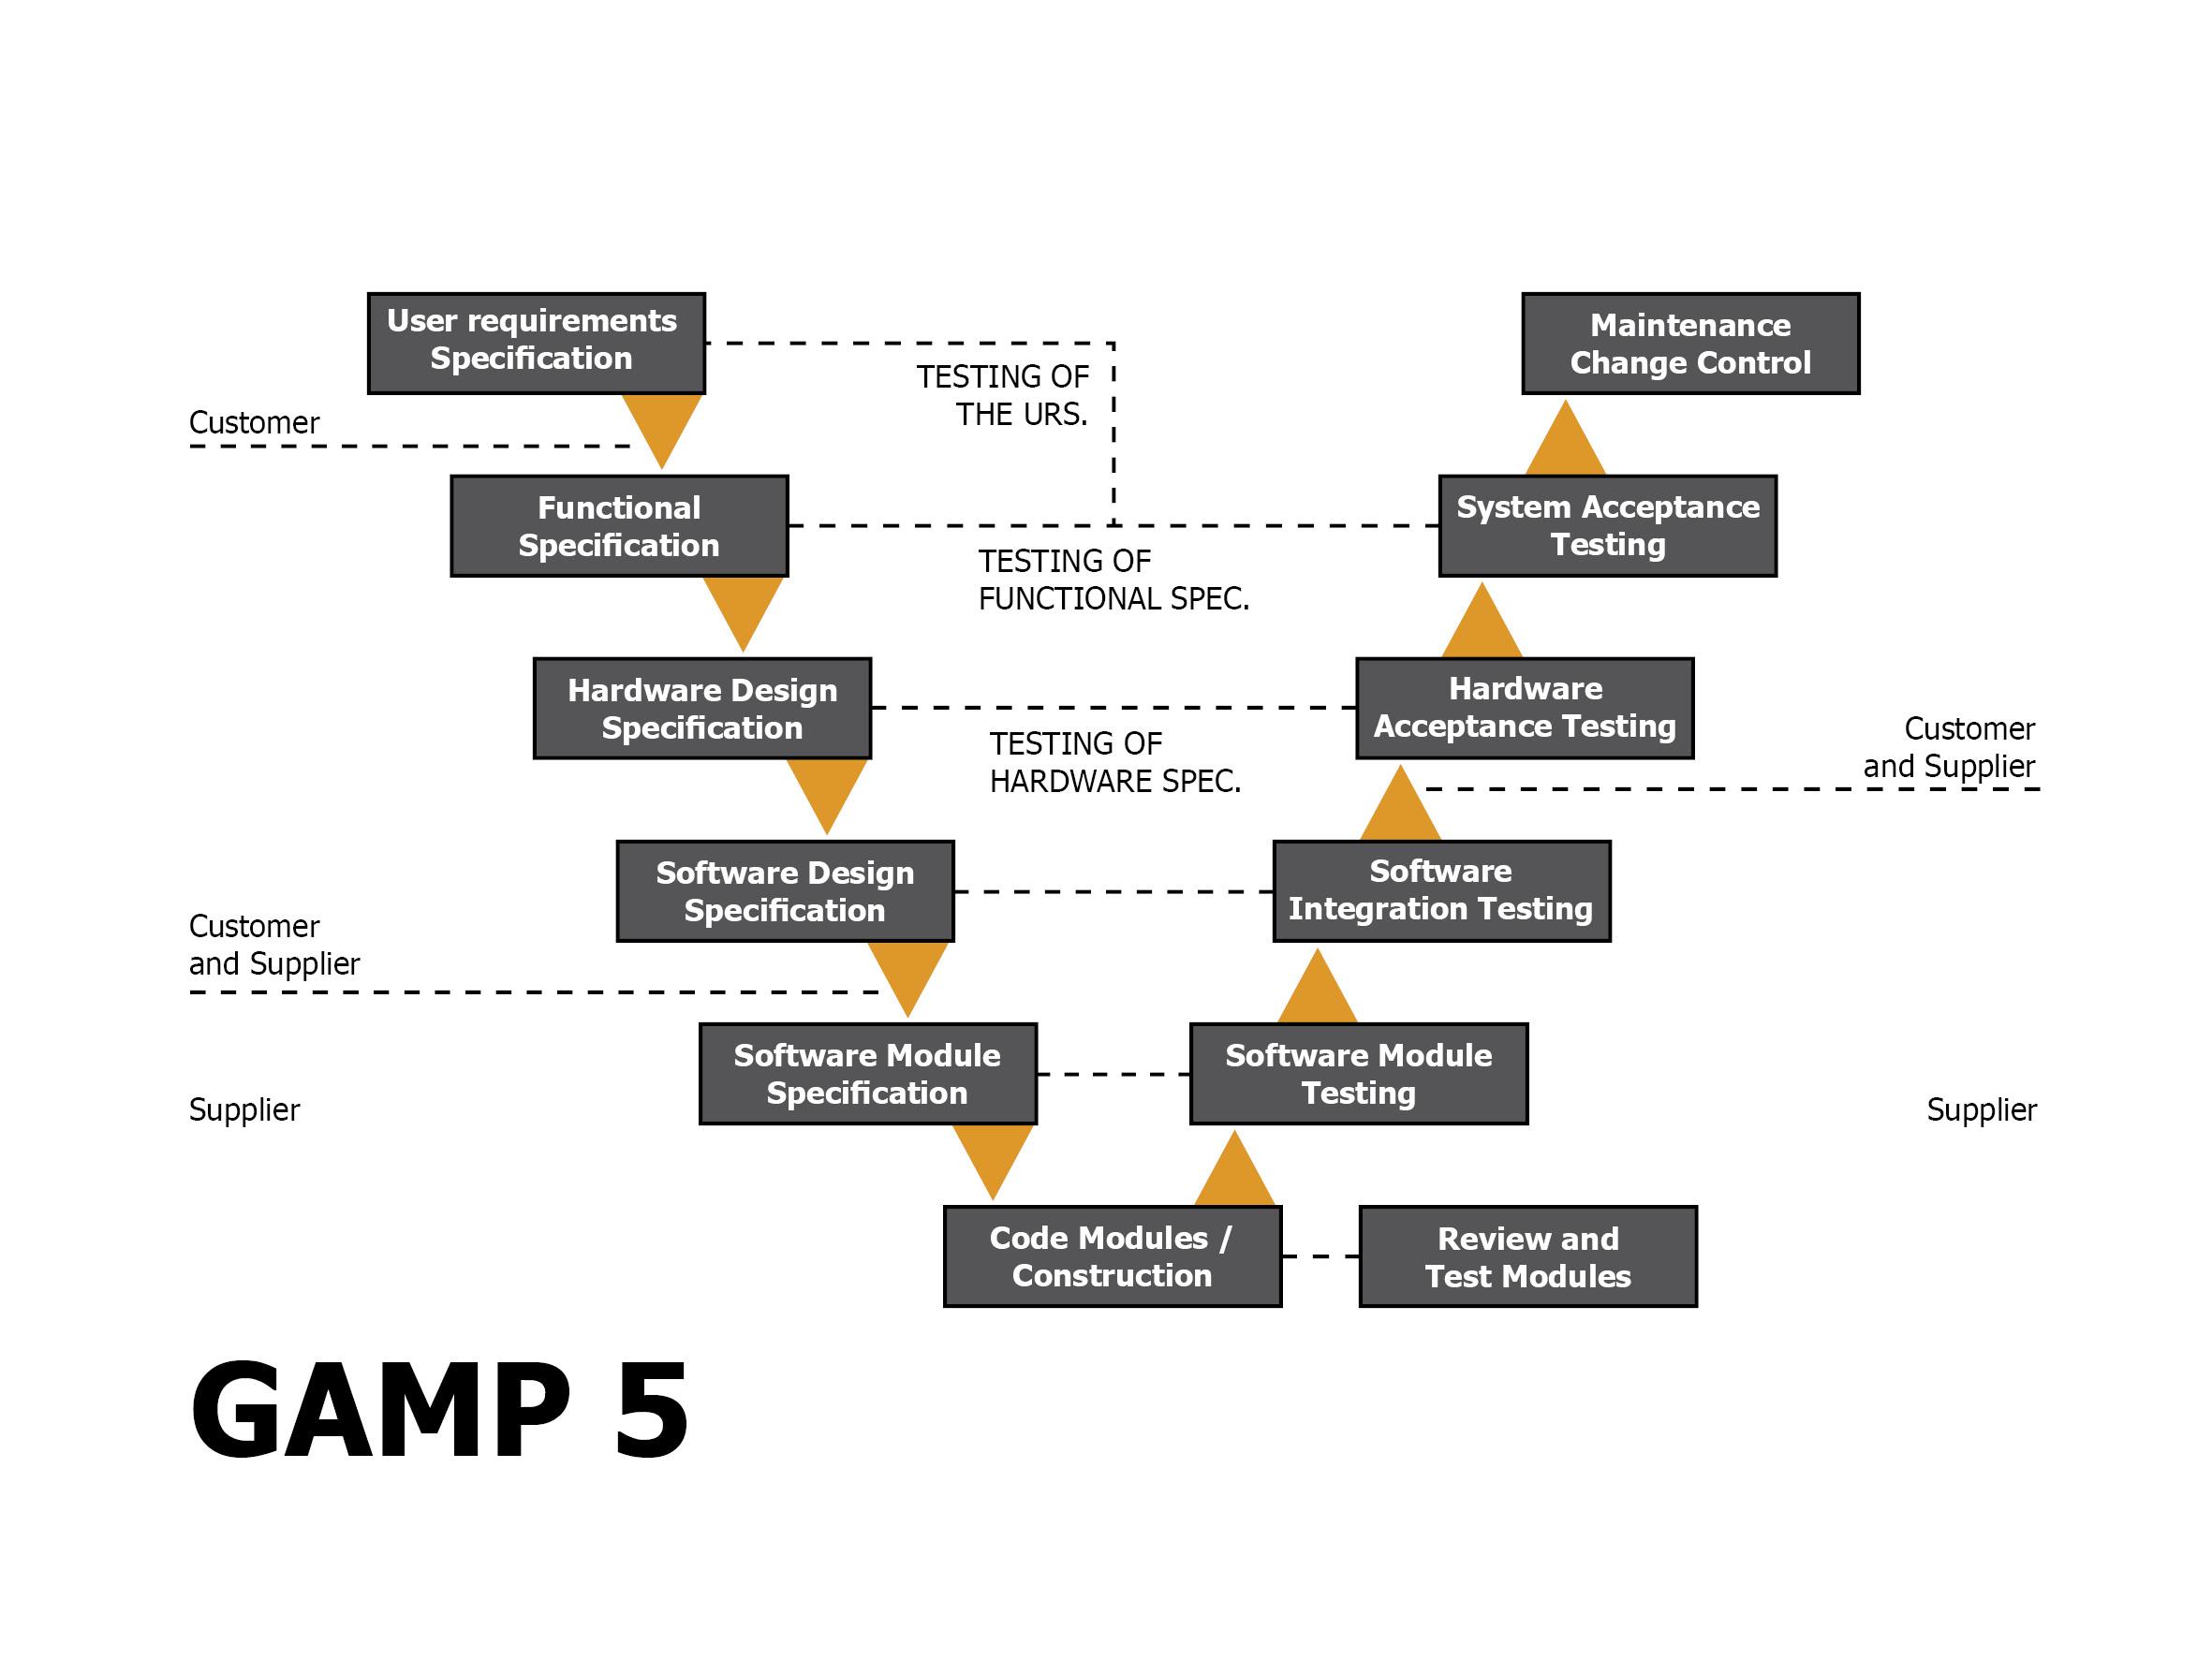 model in software testing v diagram wiring for large 7 pin trailer plug gamp 5 lasertec ie